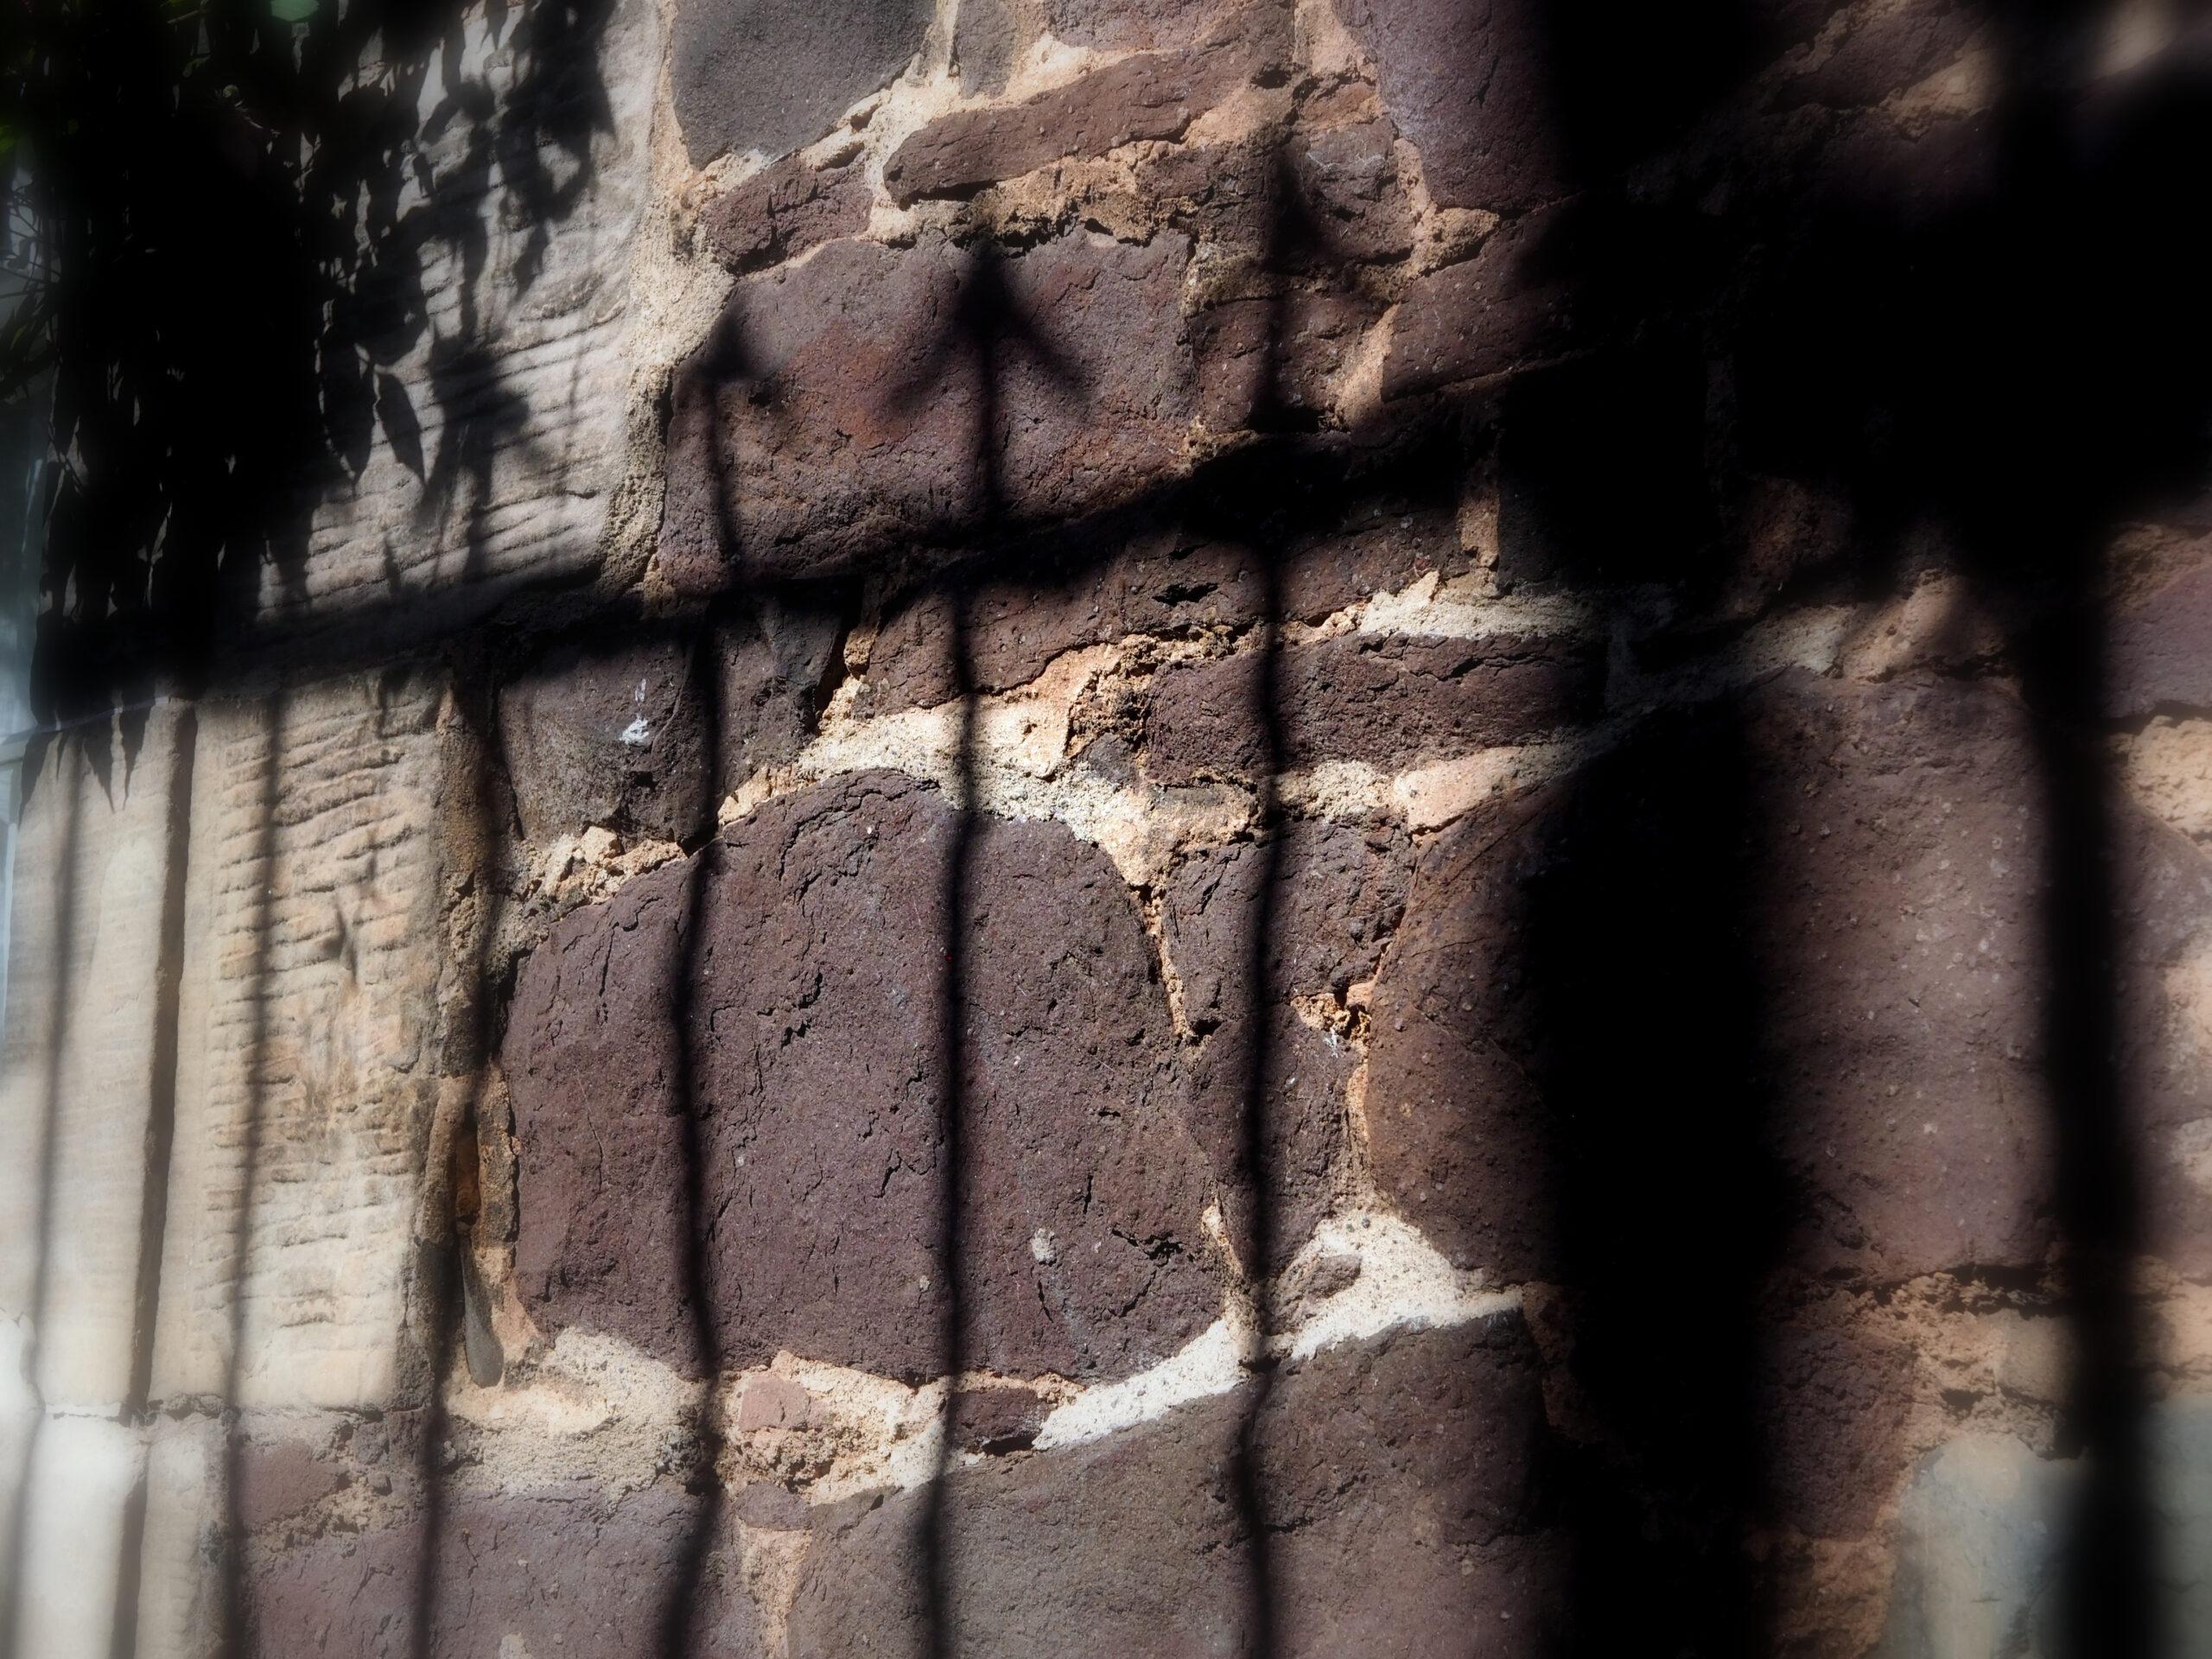 The-cast-iron-arrow-head-railings-make-shadows-on-the-wall